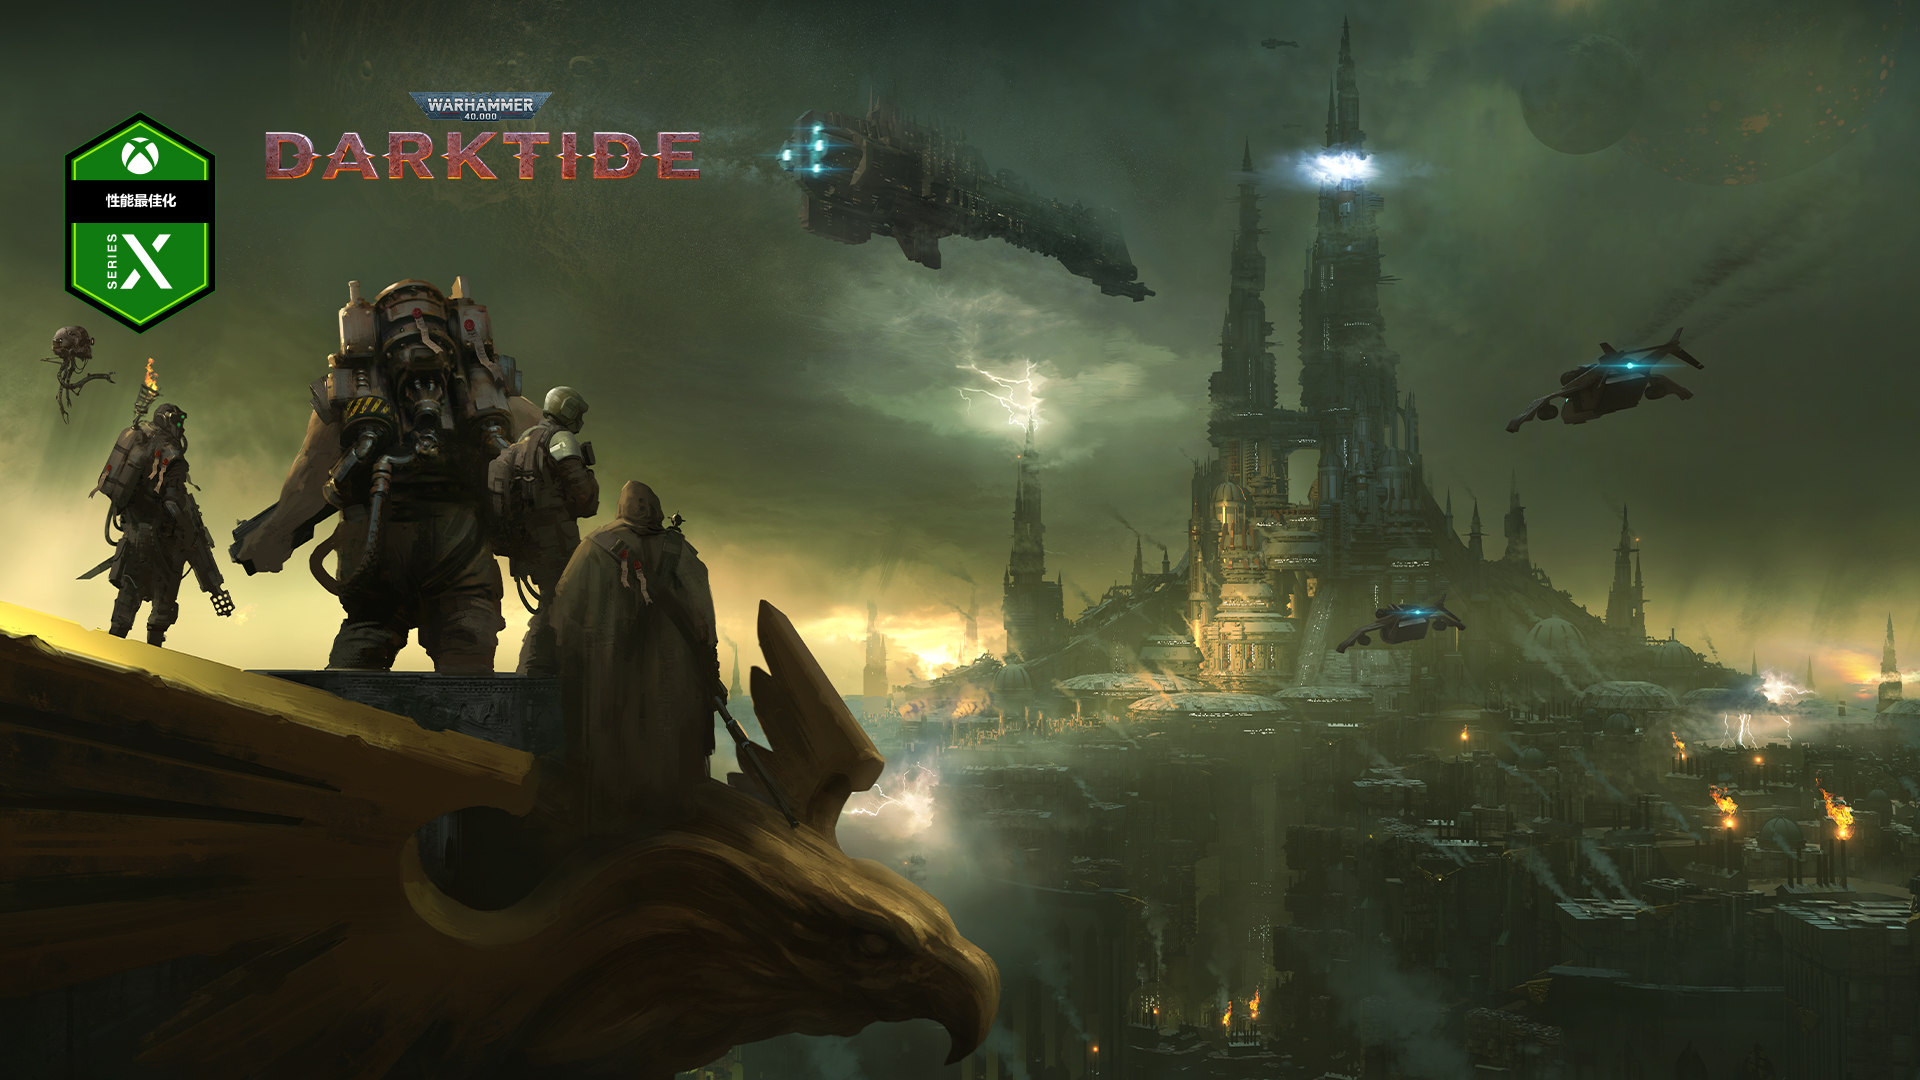 Series X 性能最佳化,Warhammer 40,000 Darktide,一群角色俯瞰籠罩在霧中的城市。